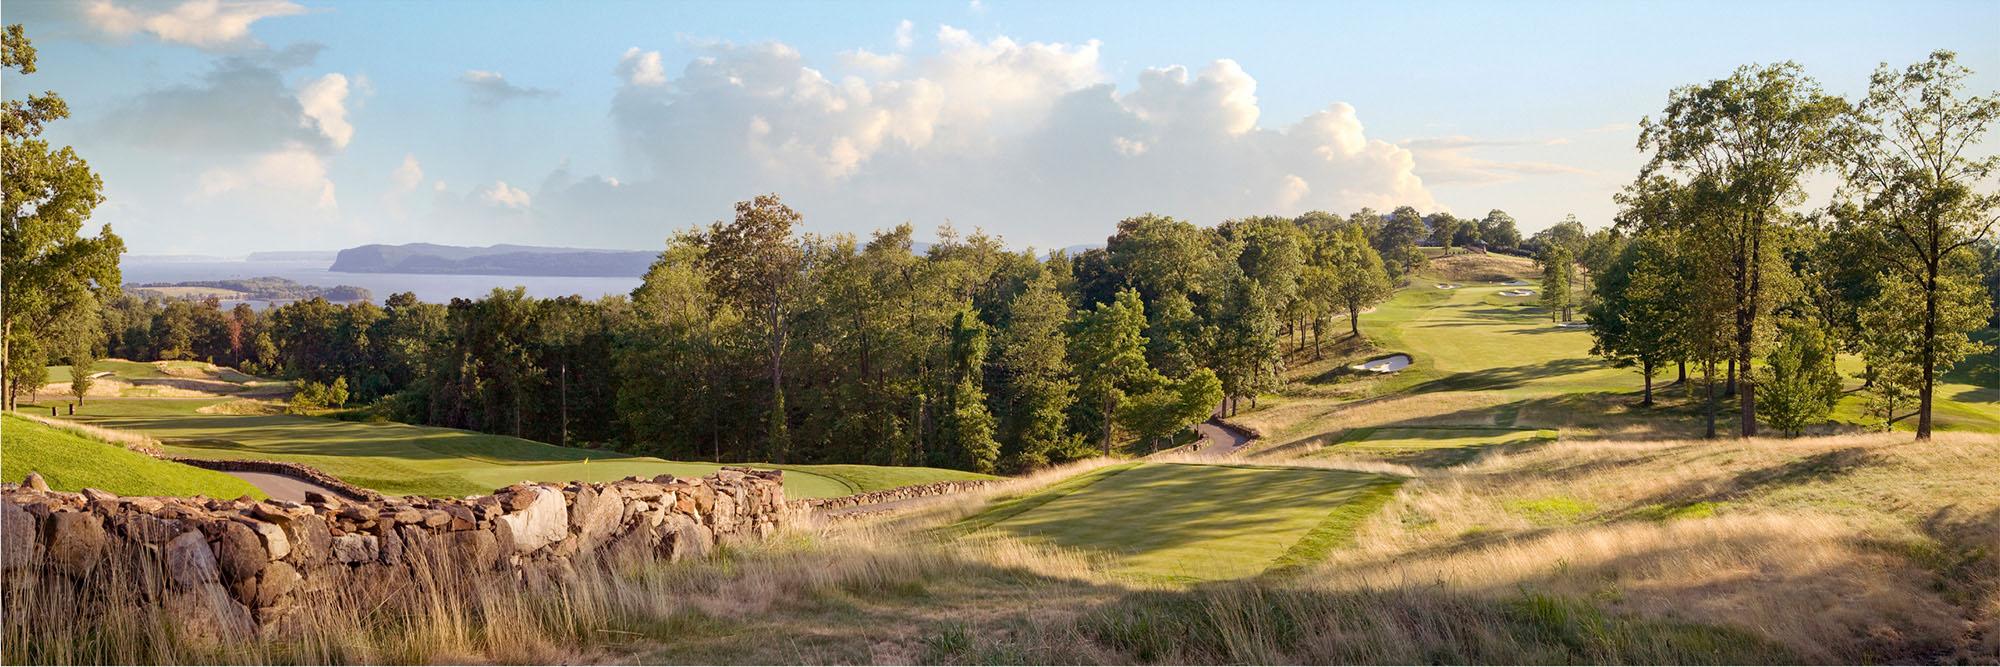 Golf Course Image - Hudson National No. 18